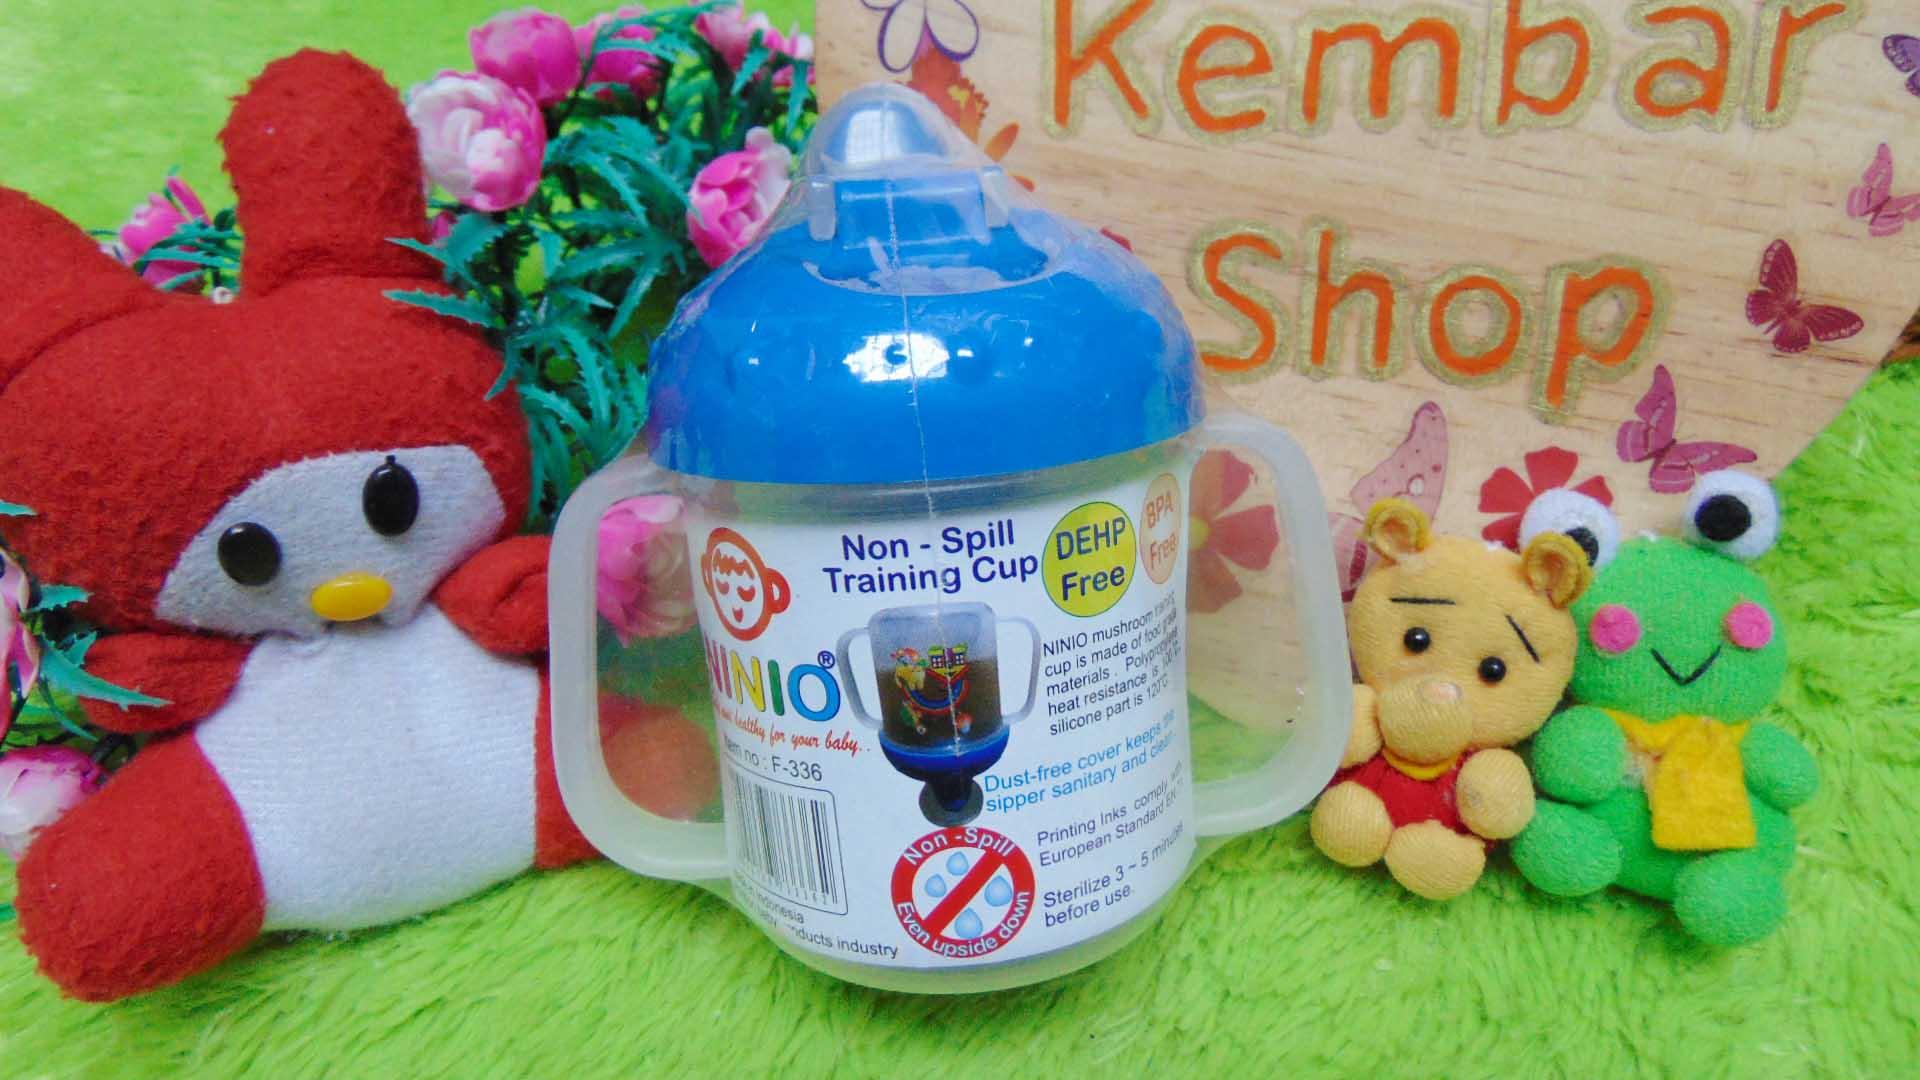 Training Spout Cup gelas minum bayi Anti Tumpah Tahan Panas Ninio BPA FREE biru (2)